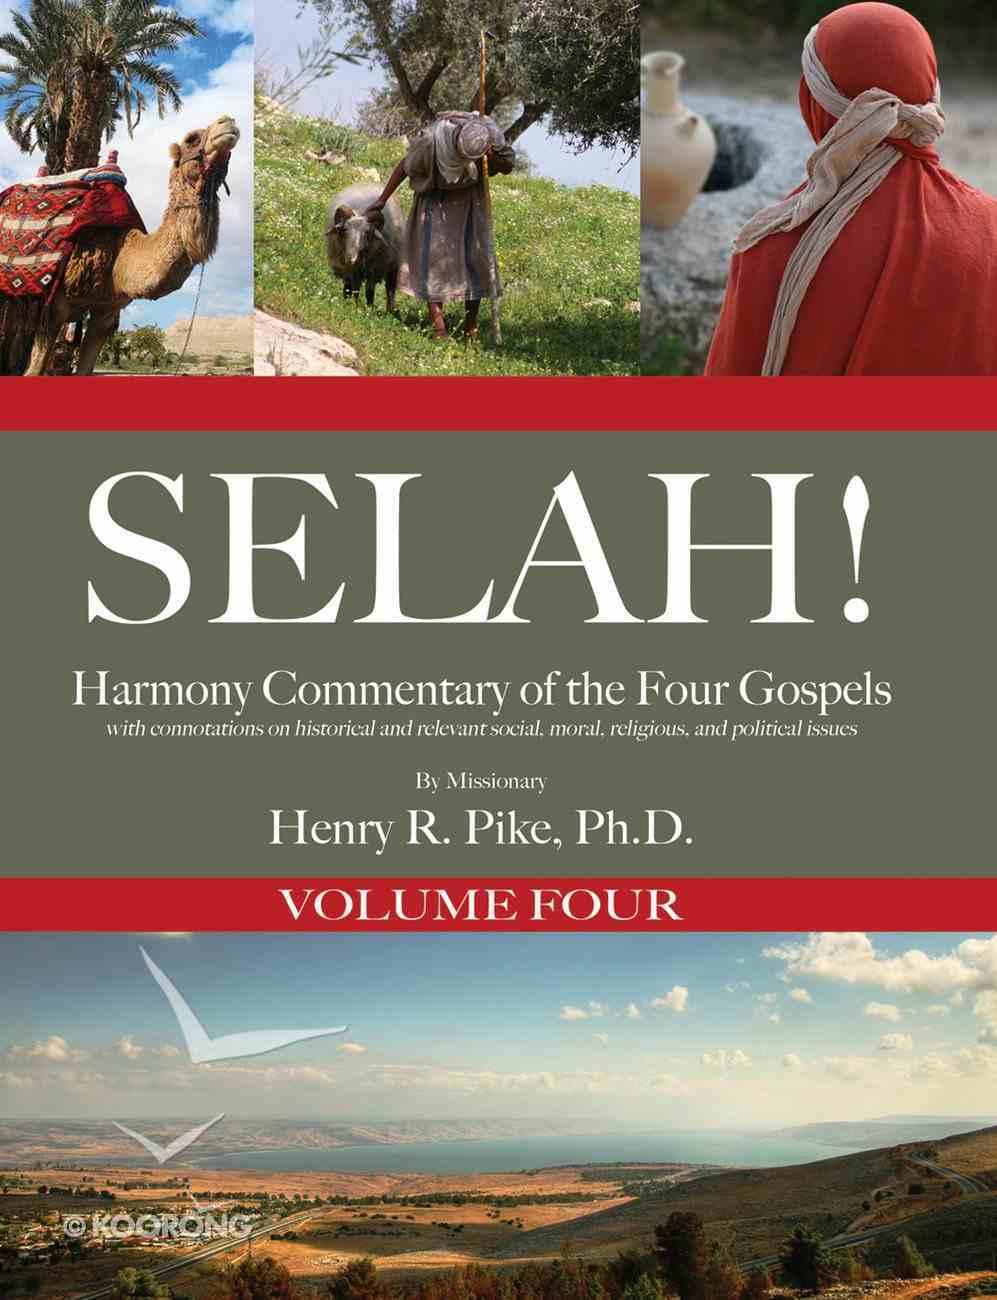 Selah! Harmony Commentary of the Four Gospels, Ebook Volume 4 eBook